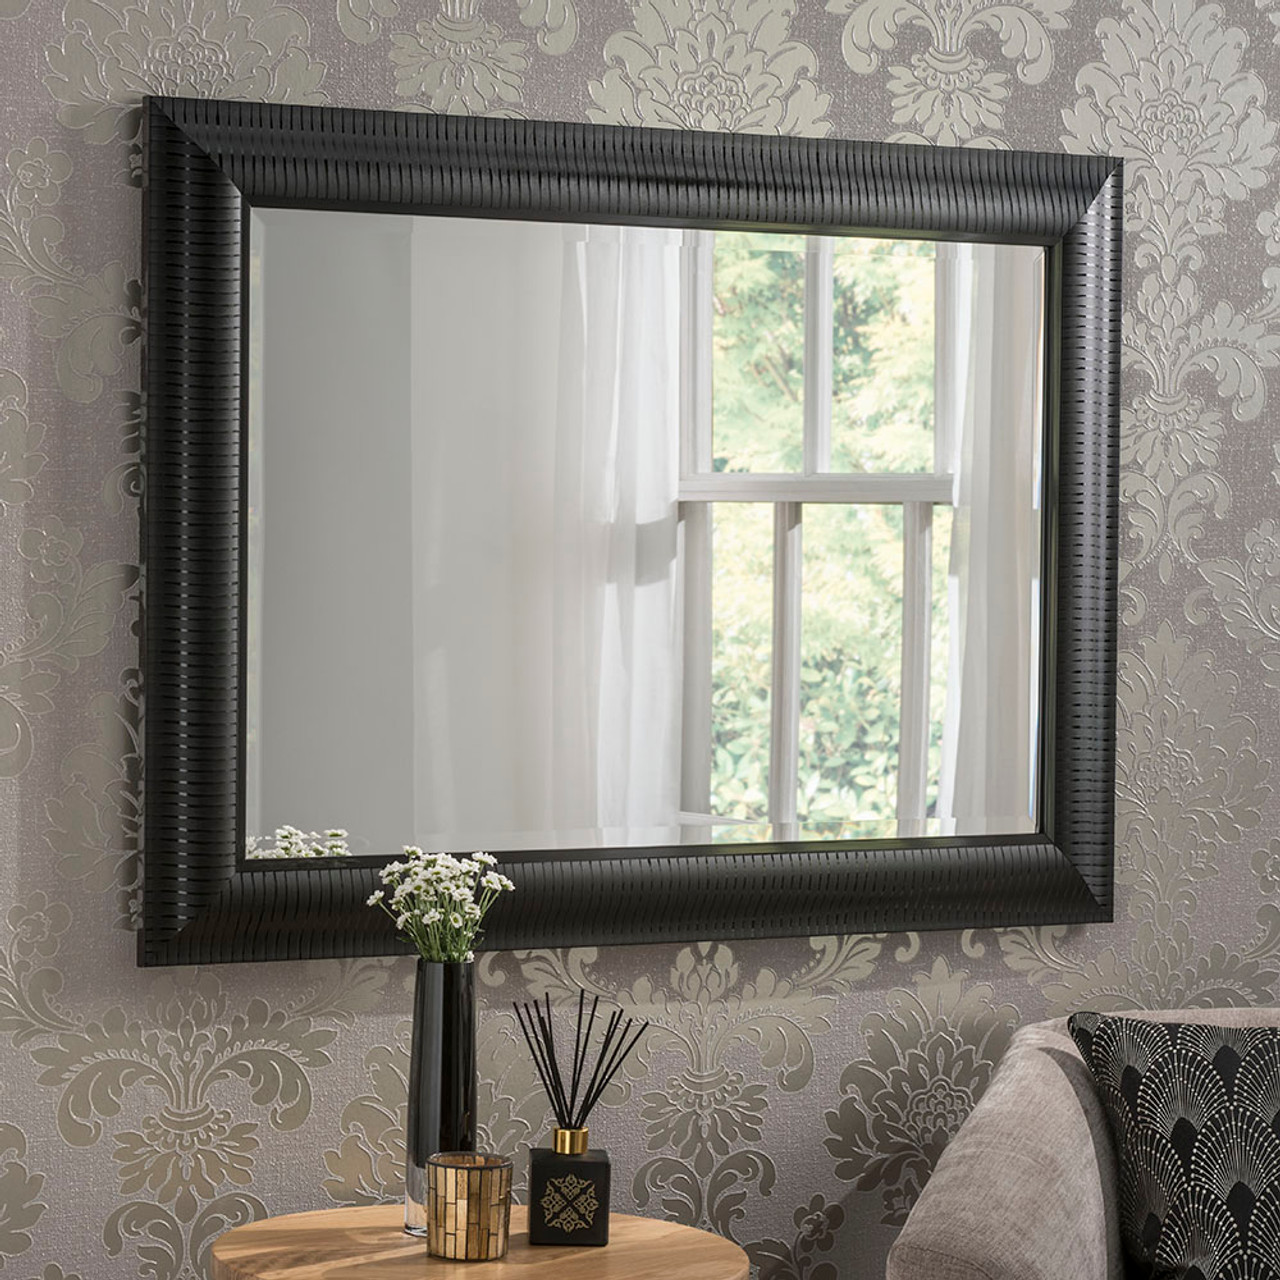 Image of Kenzie Black Rectangular Mirror